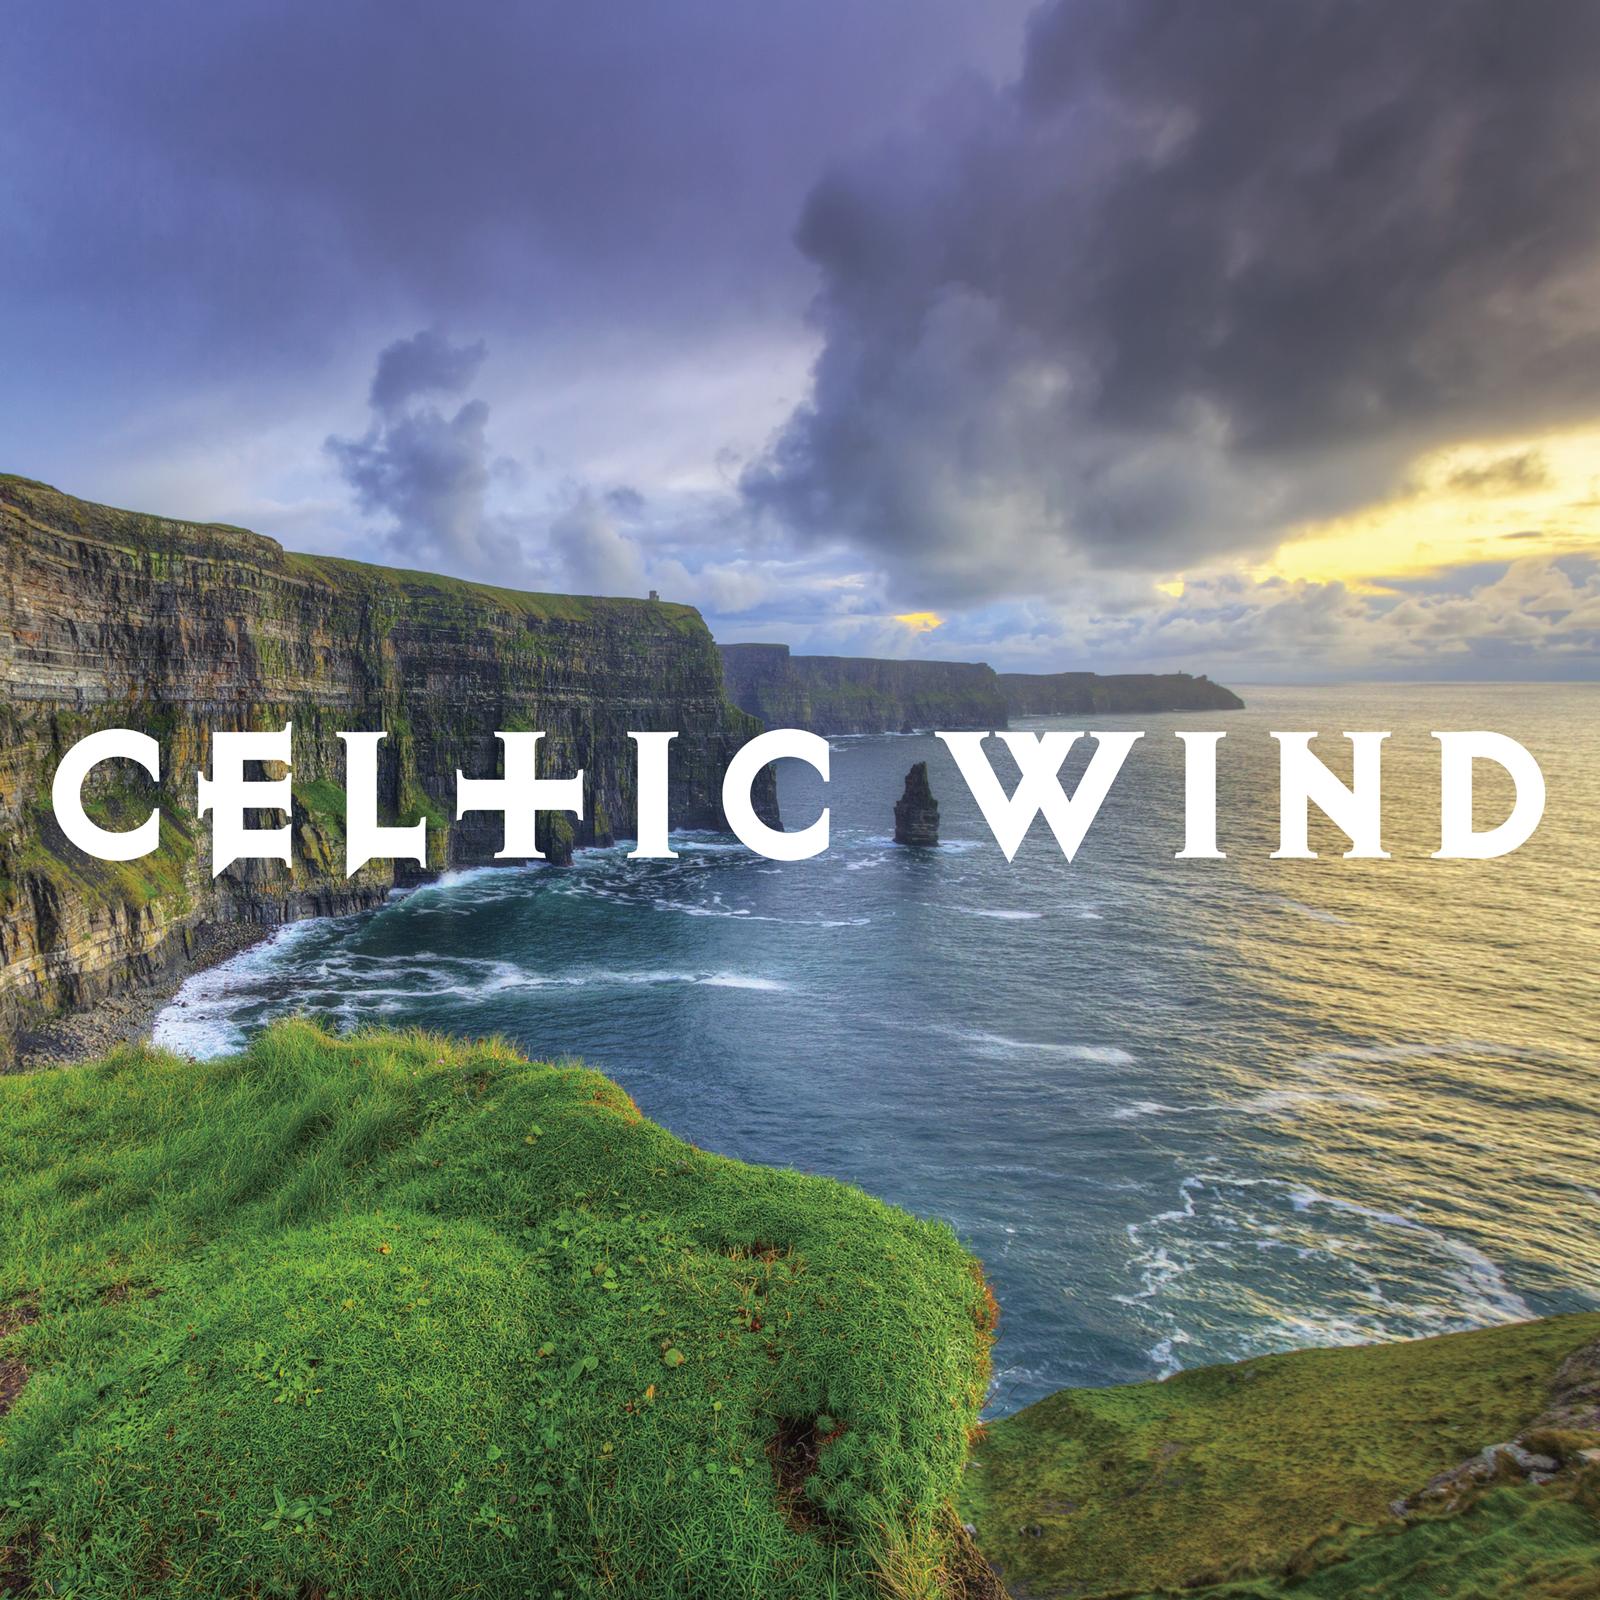 CelticWind